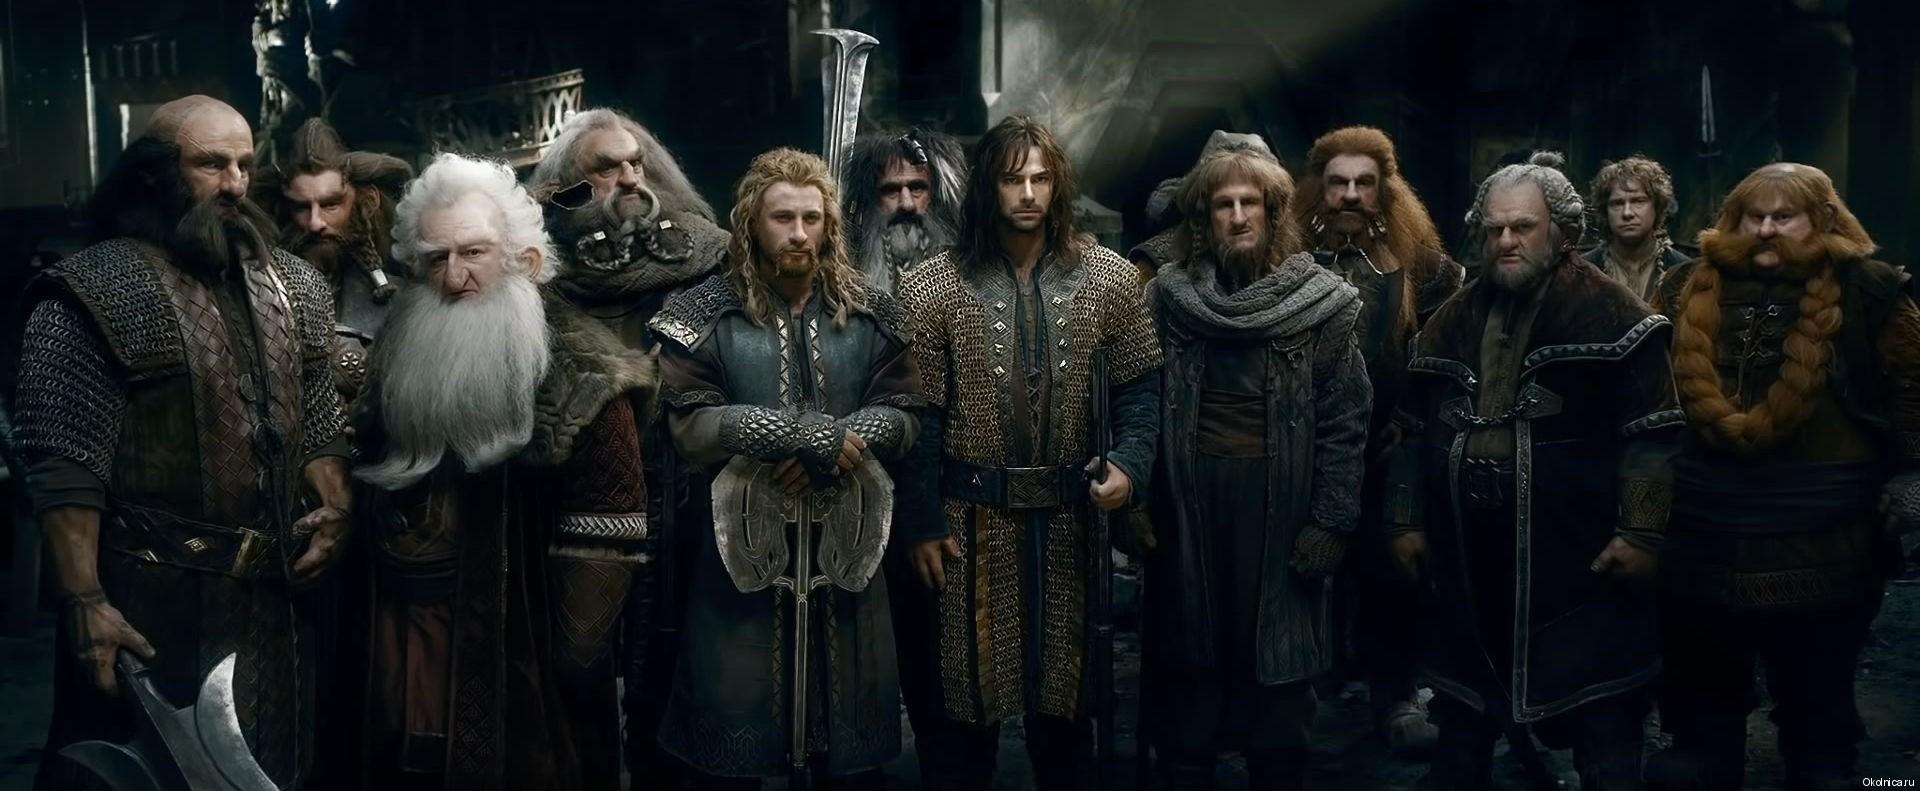 Kino_Hobbit_Bitva_pyati_voinstv_09